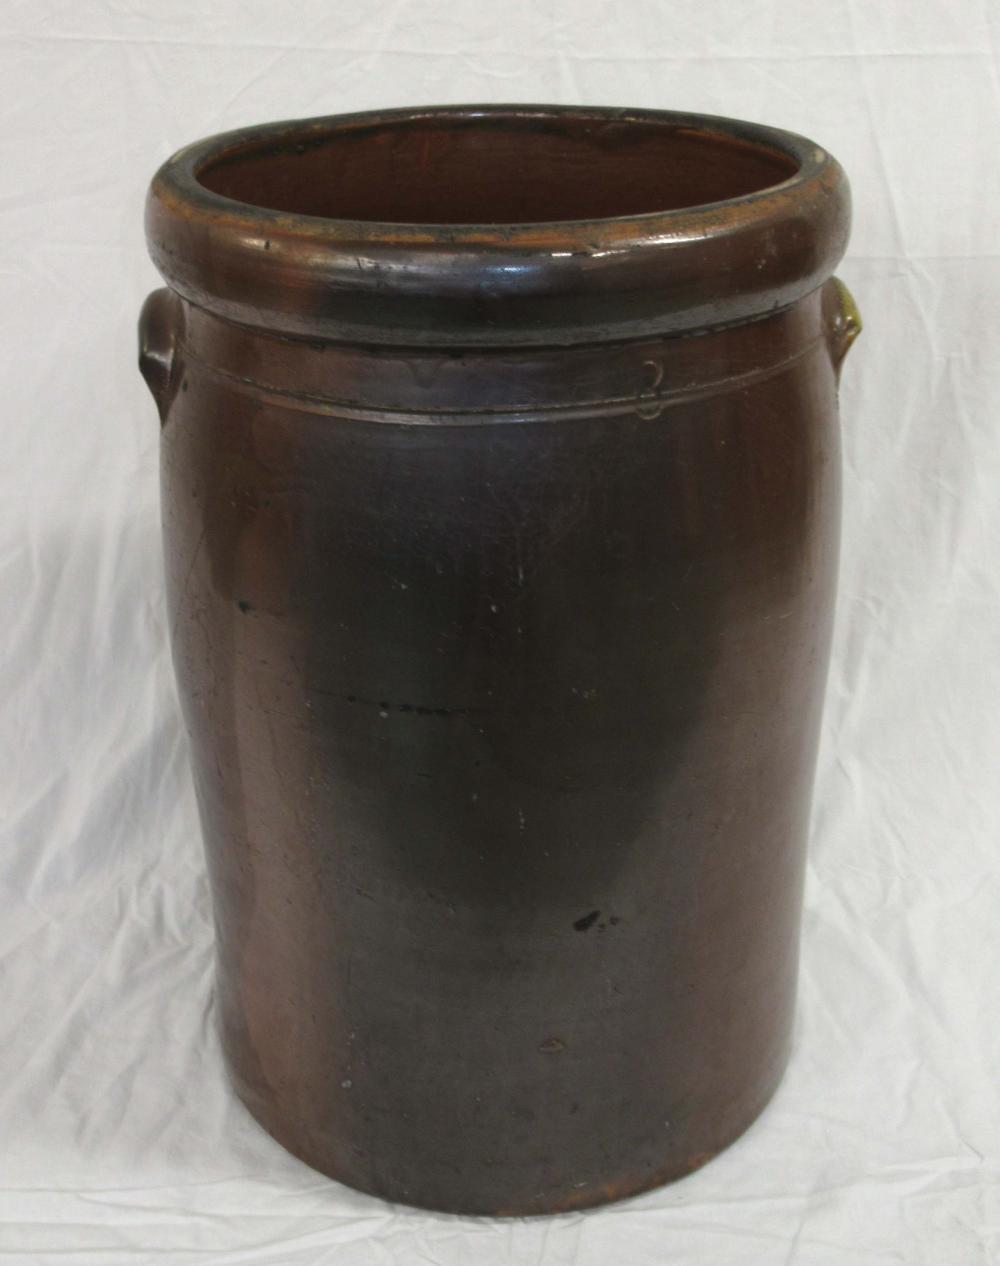 Evans Pottery 8 Gal. Crock